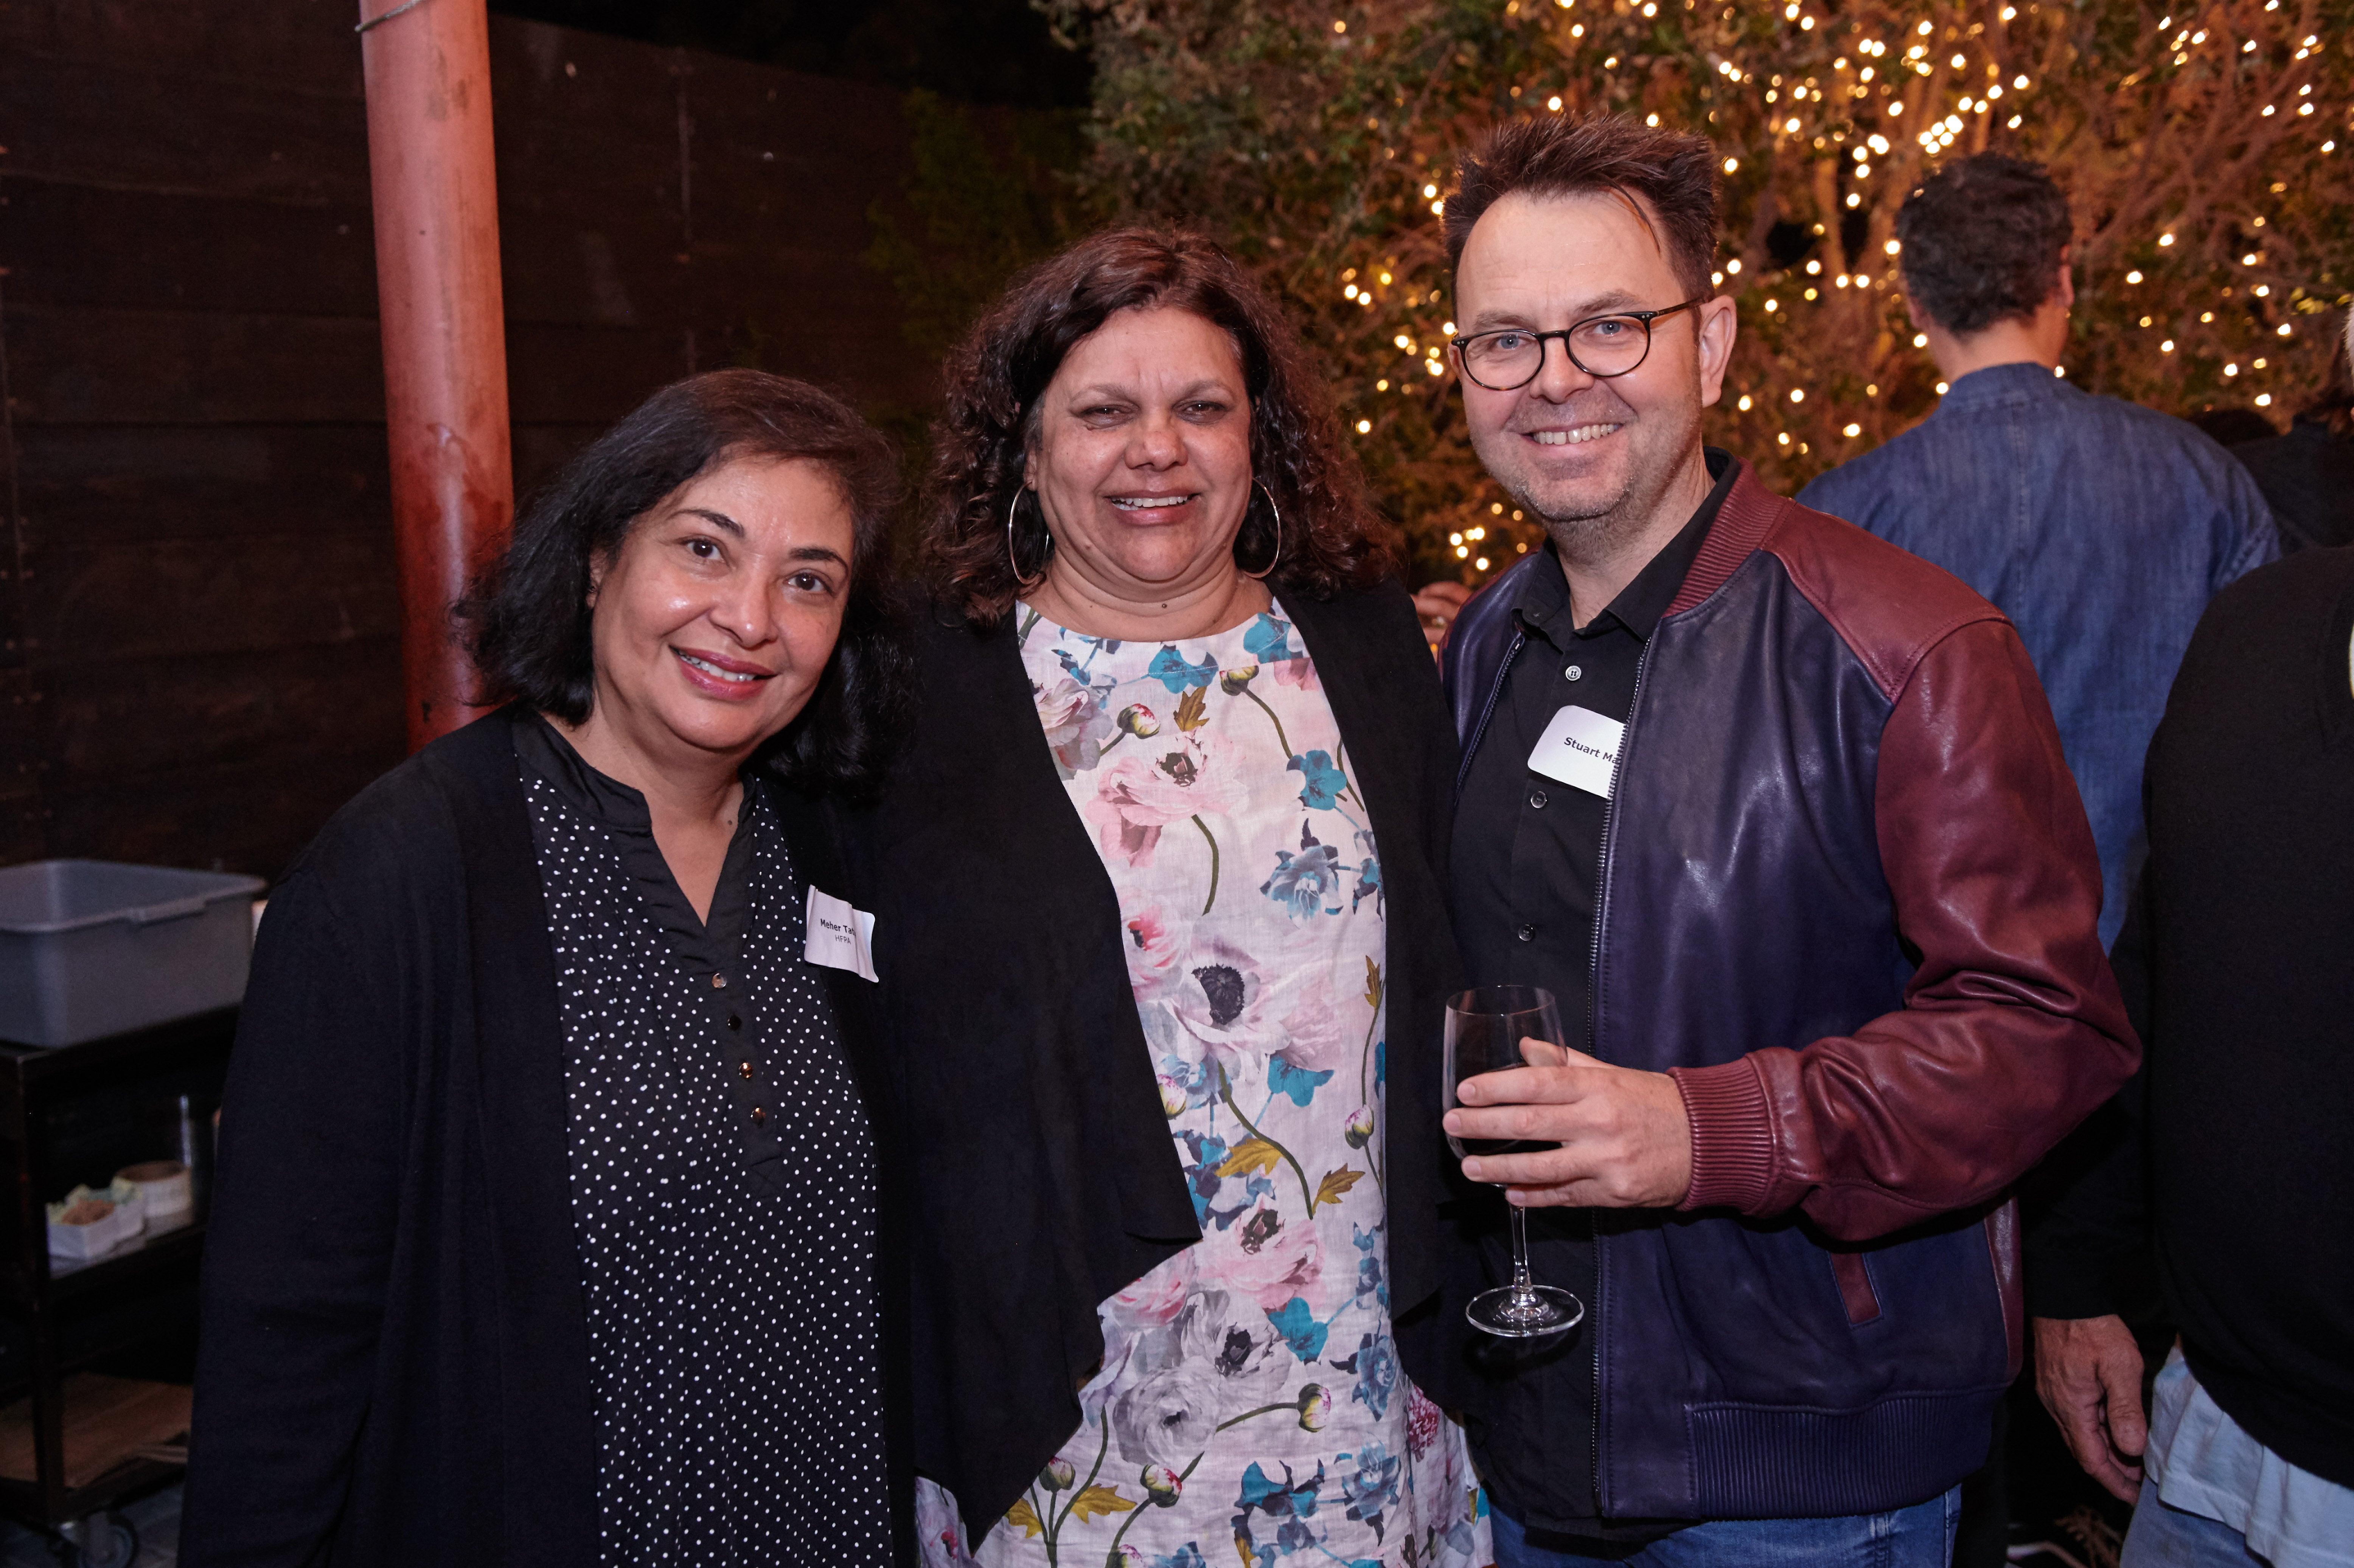 HFPA president Meher tatna delegate Erica Glynn and director Stewart McDonald